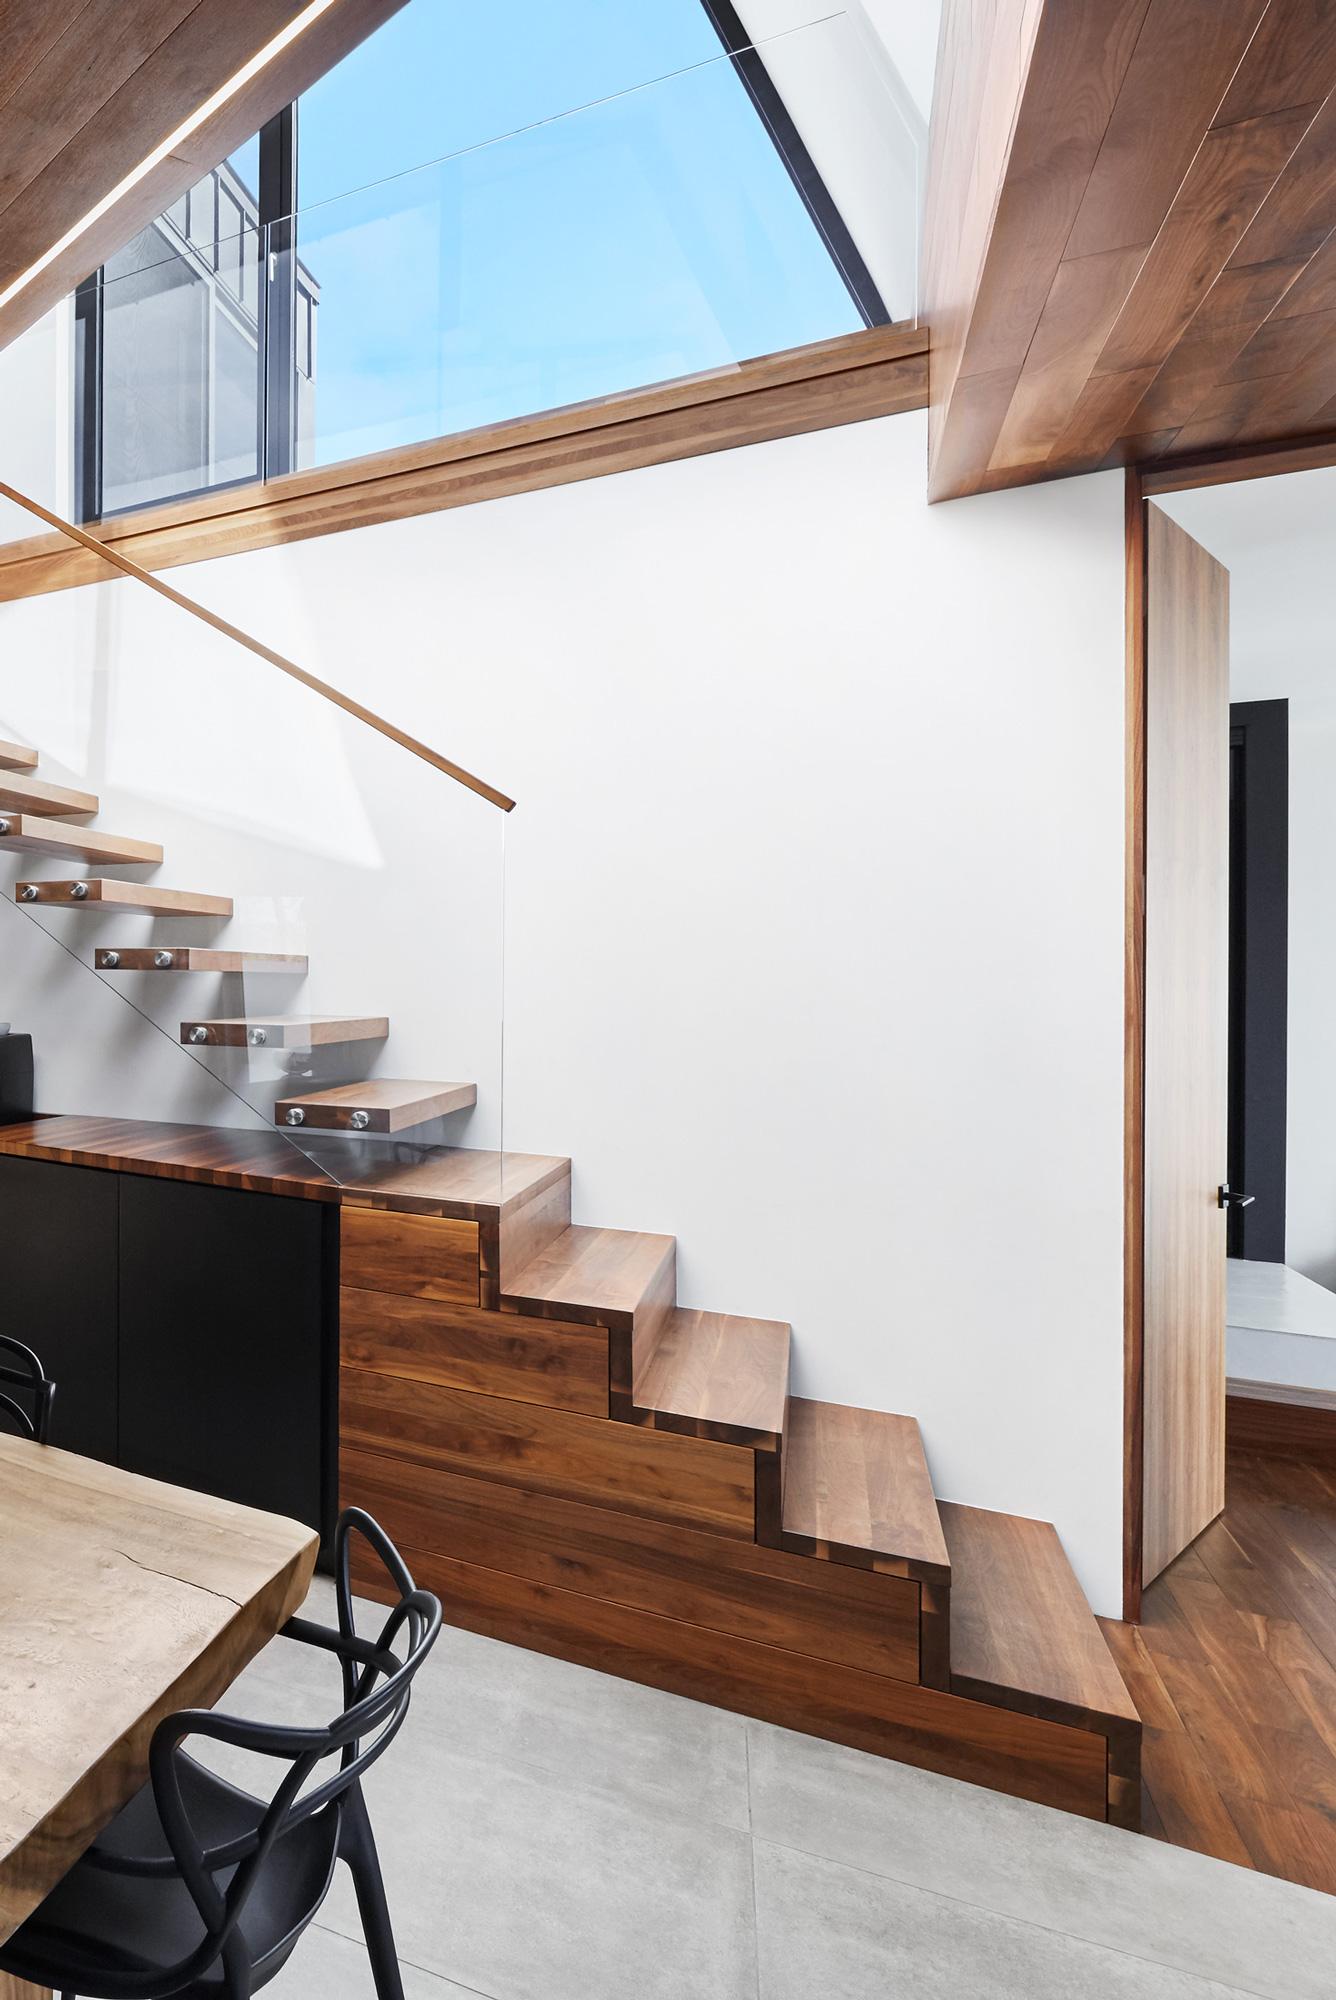 escalier noyer mur blanc fenetre etage